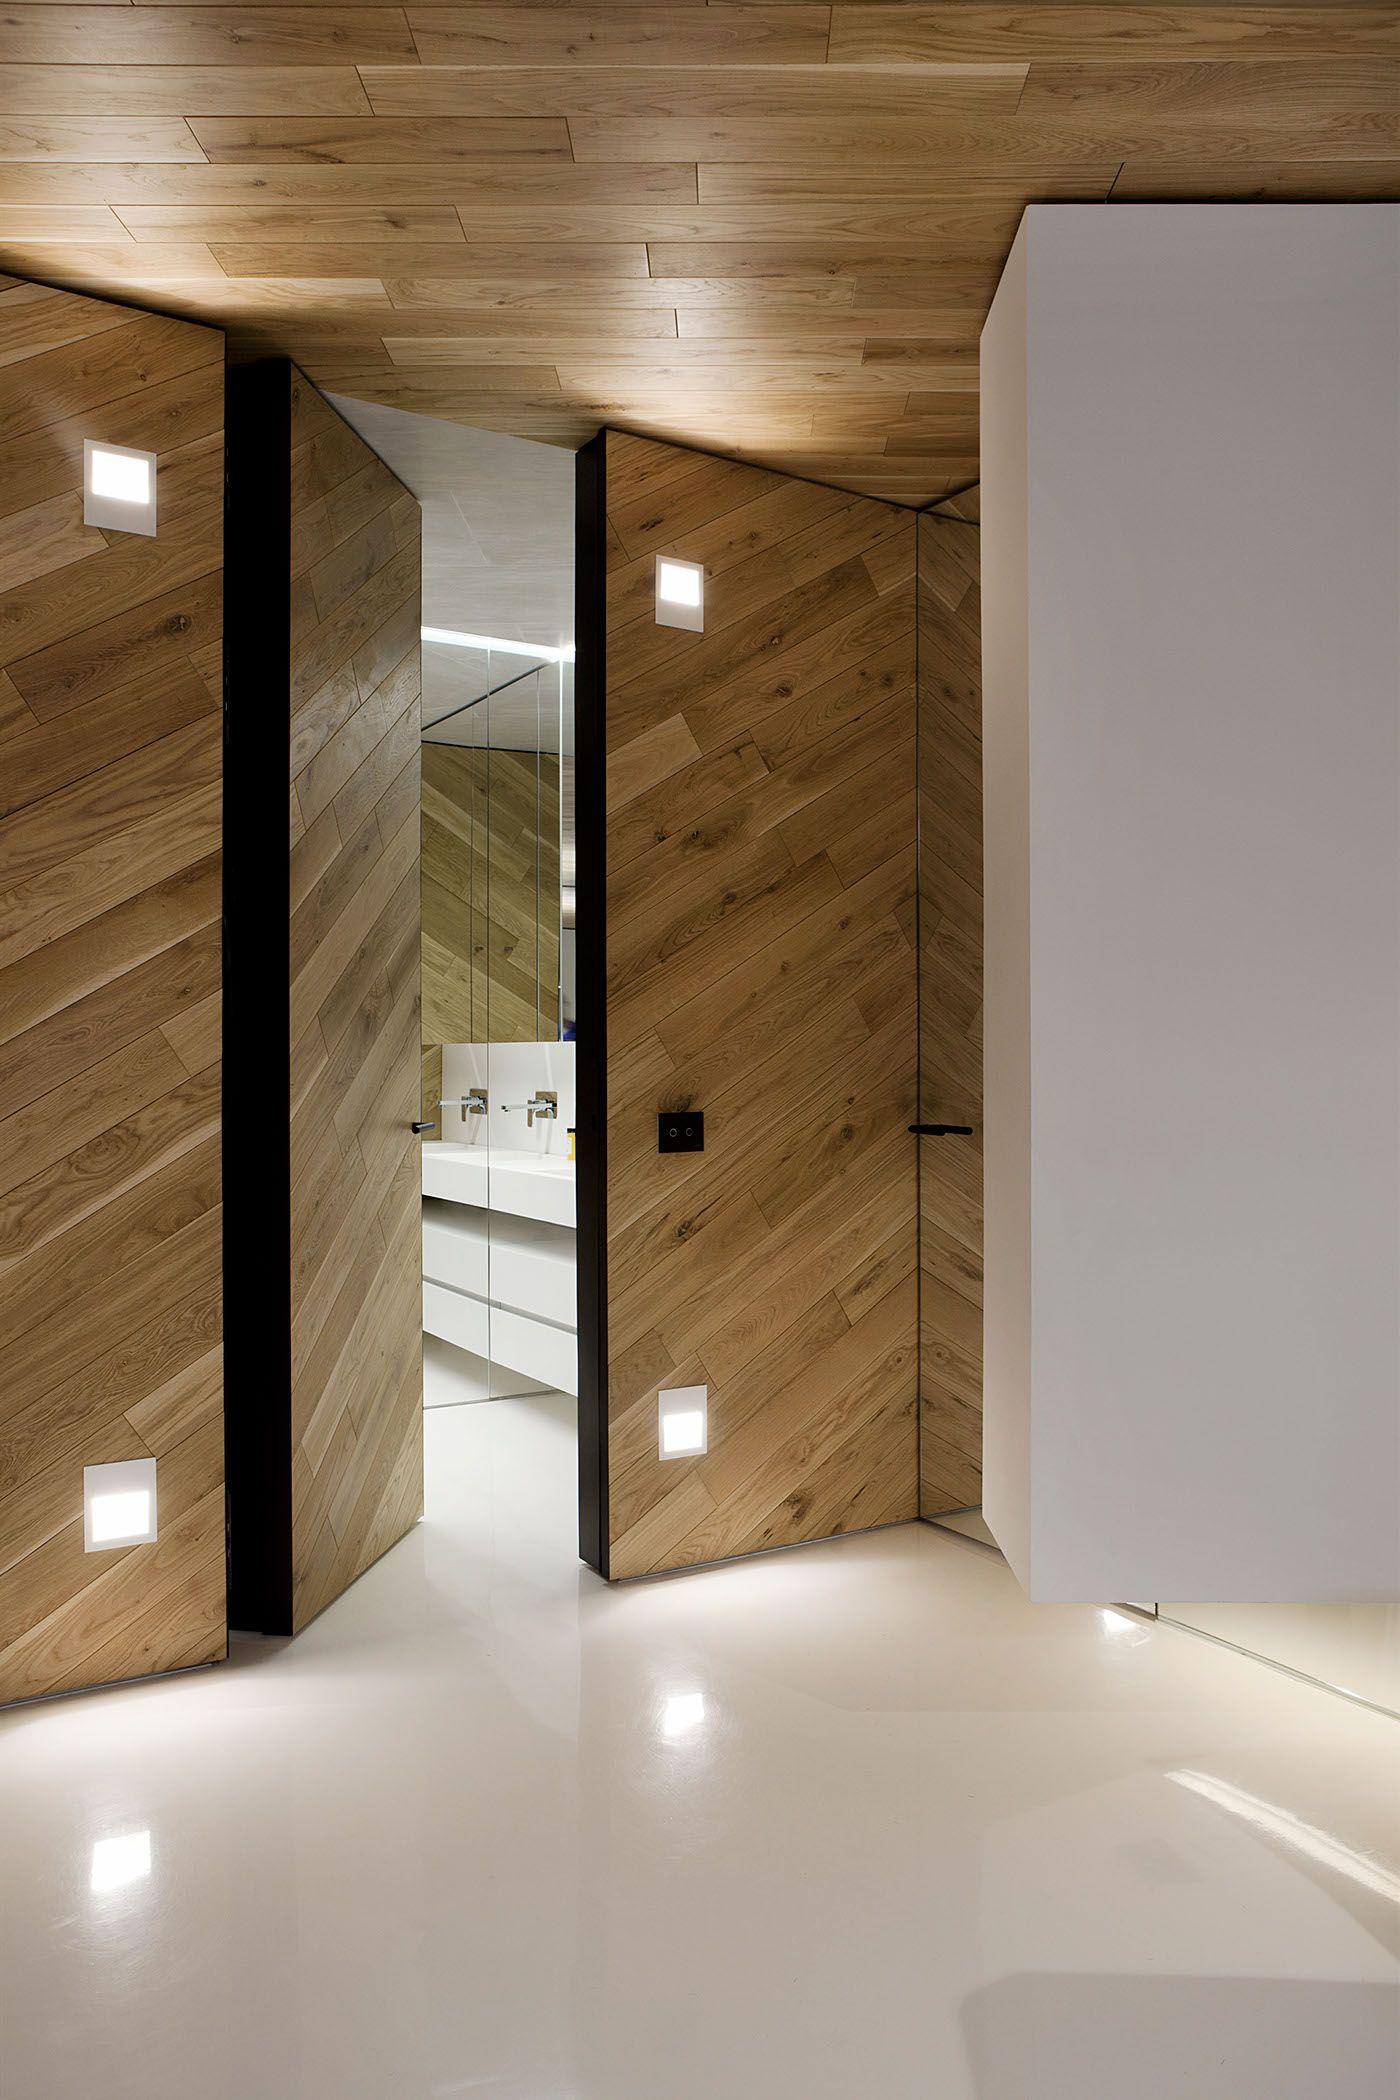 Stylish Exposed Brick Wall Lofts Loft design, Modern